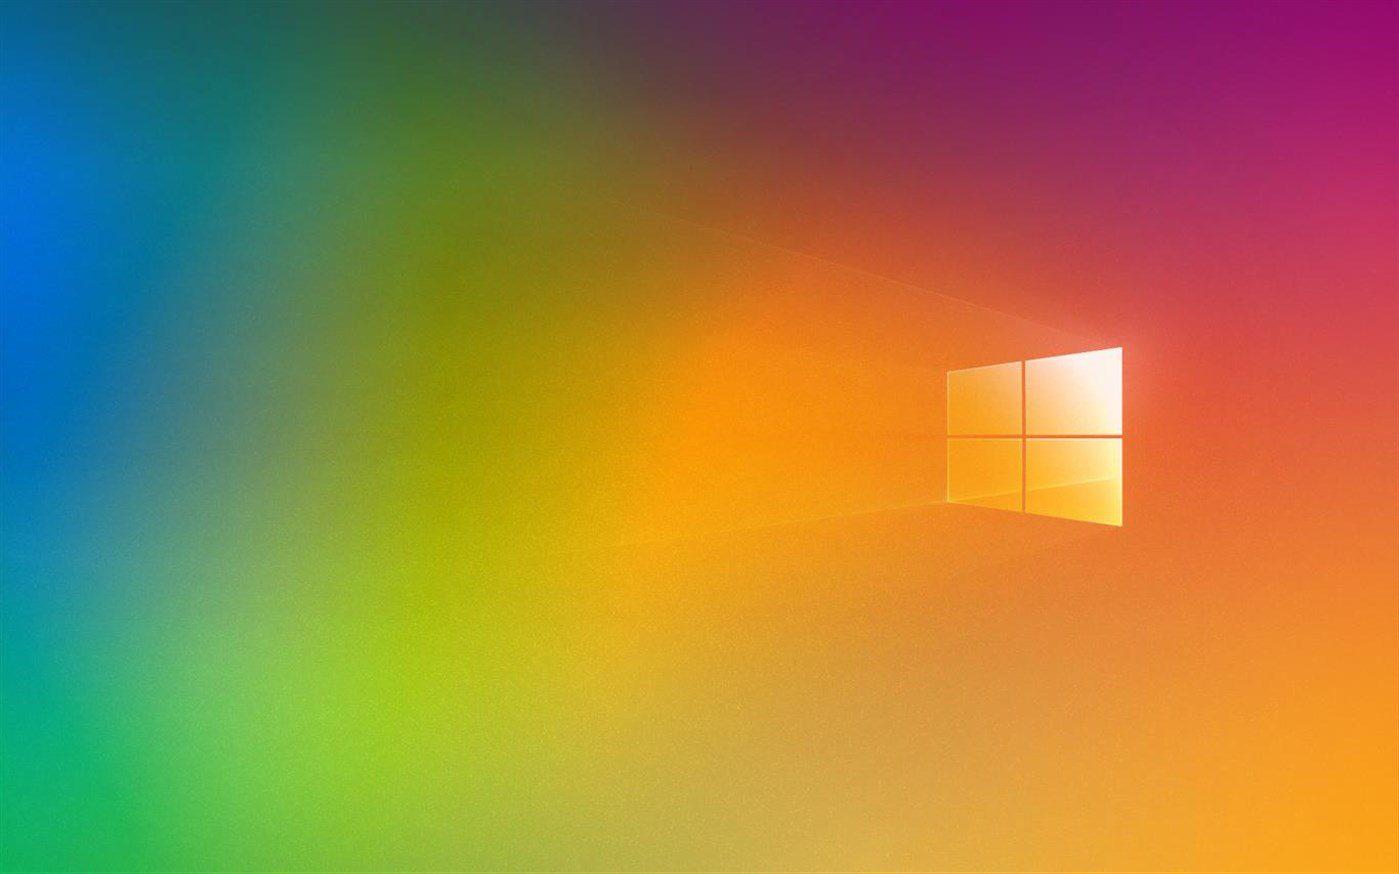 Microsoft Celebrates Pride Month With New Free Premium